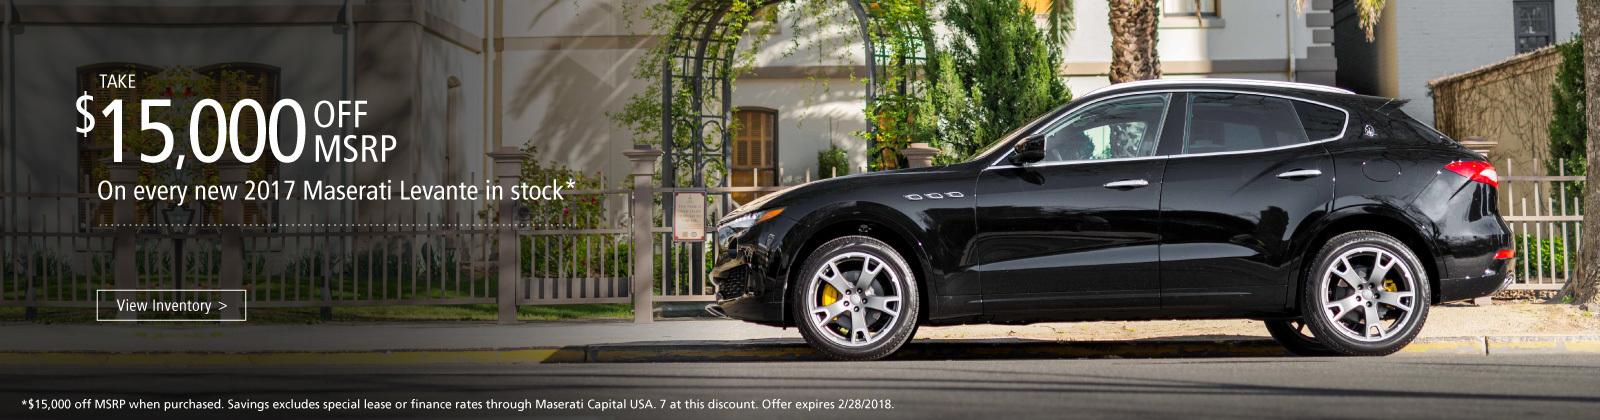 New Maserati Specials